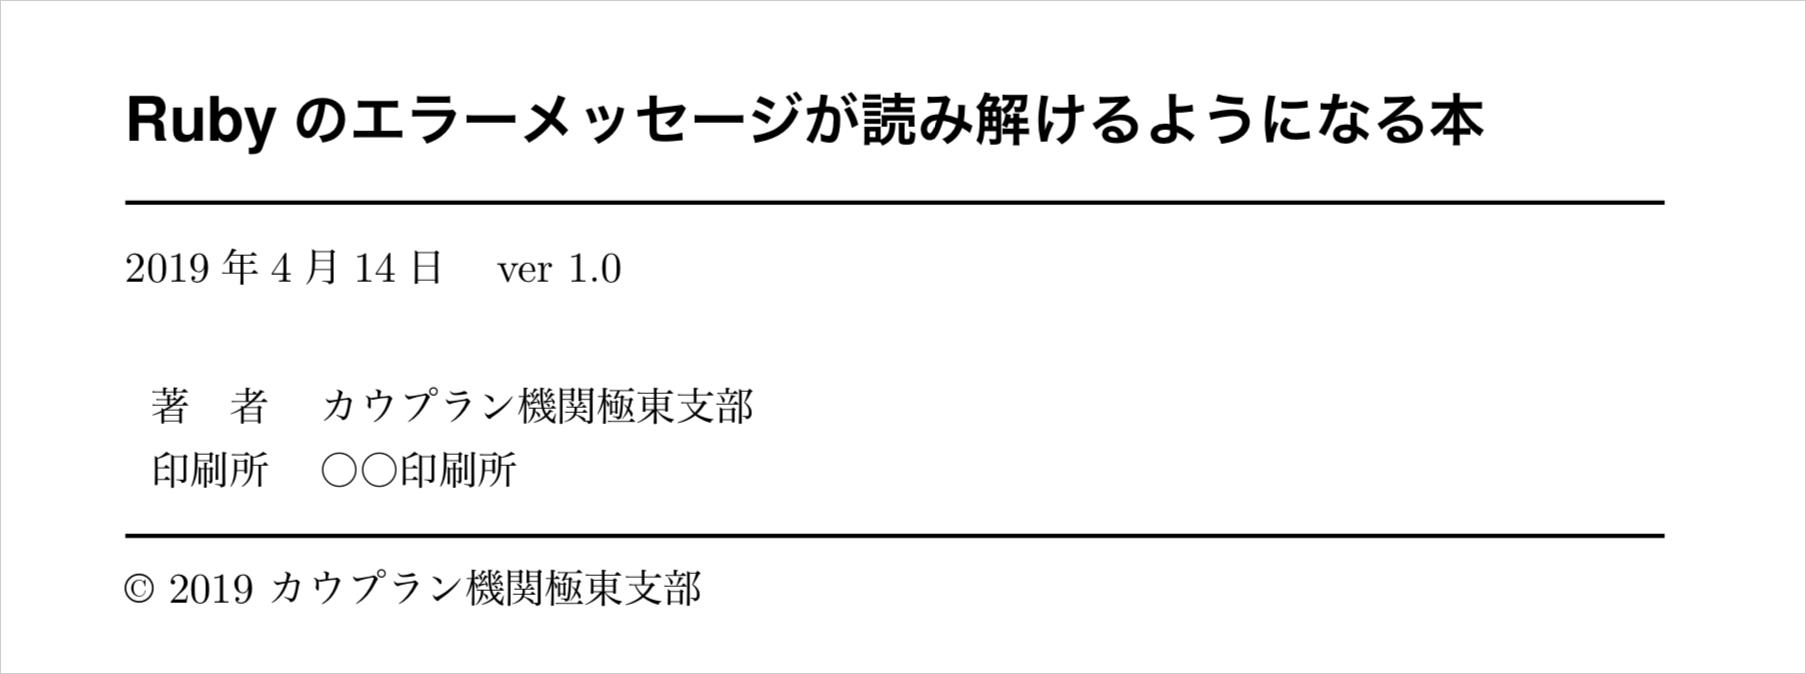 starter-A1.png